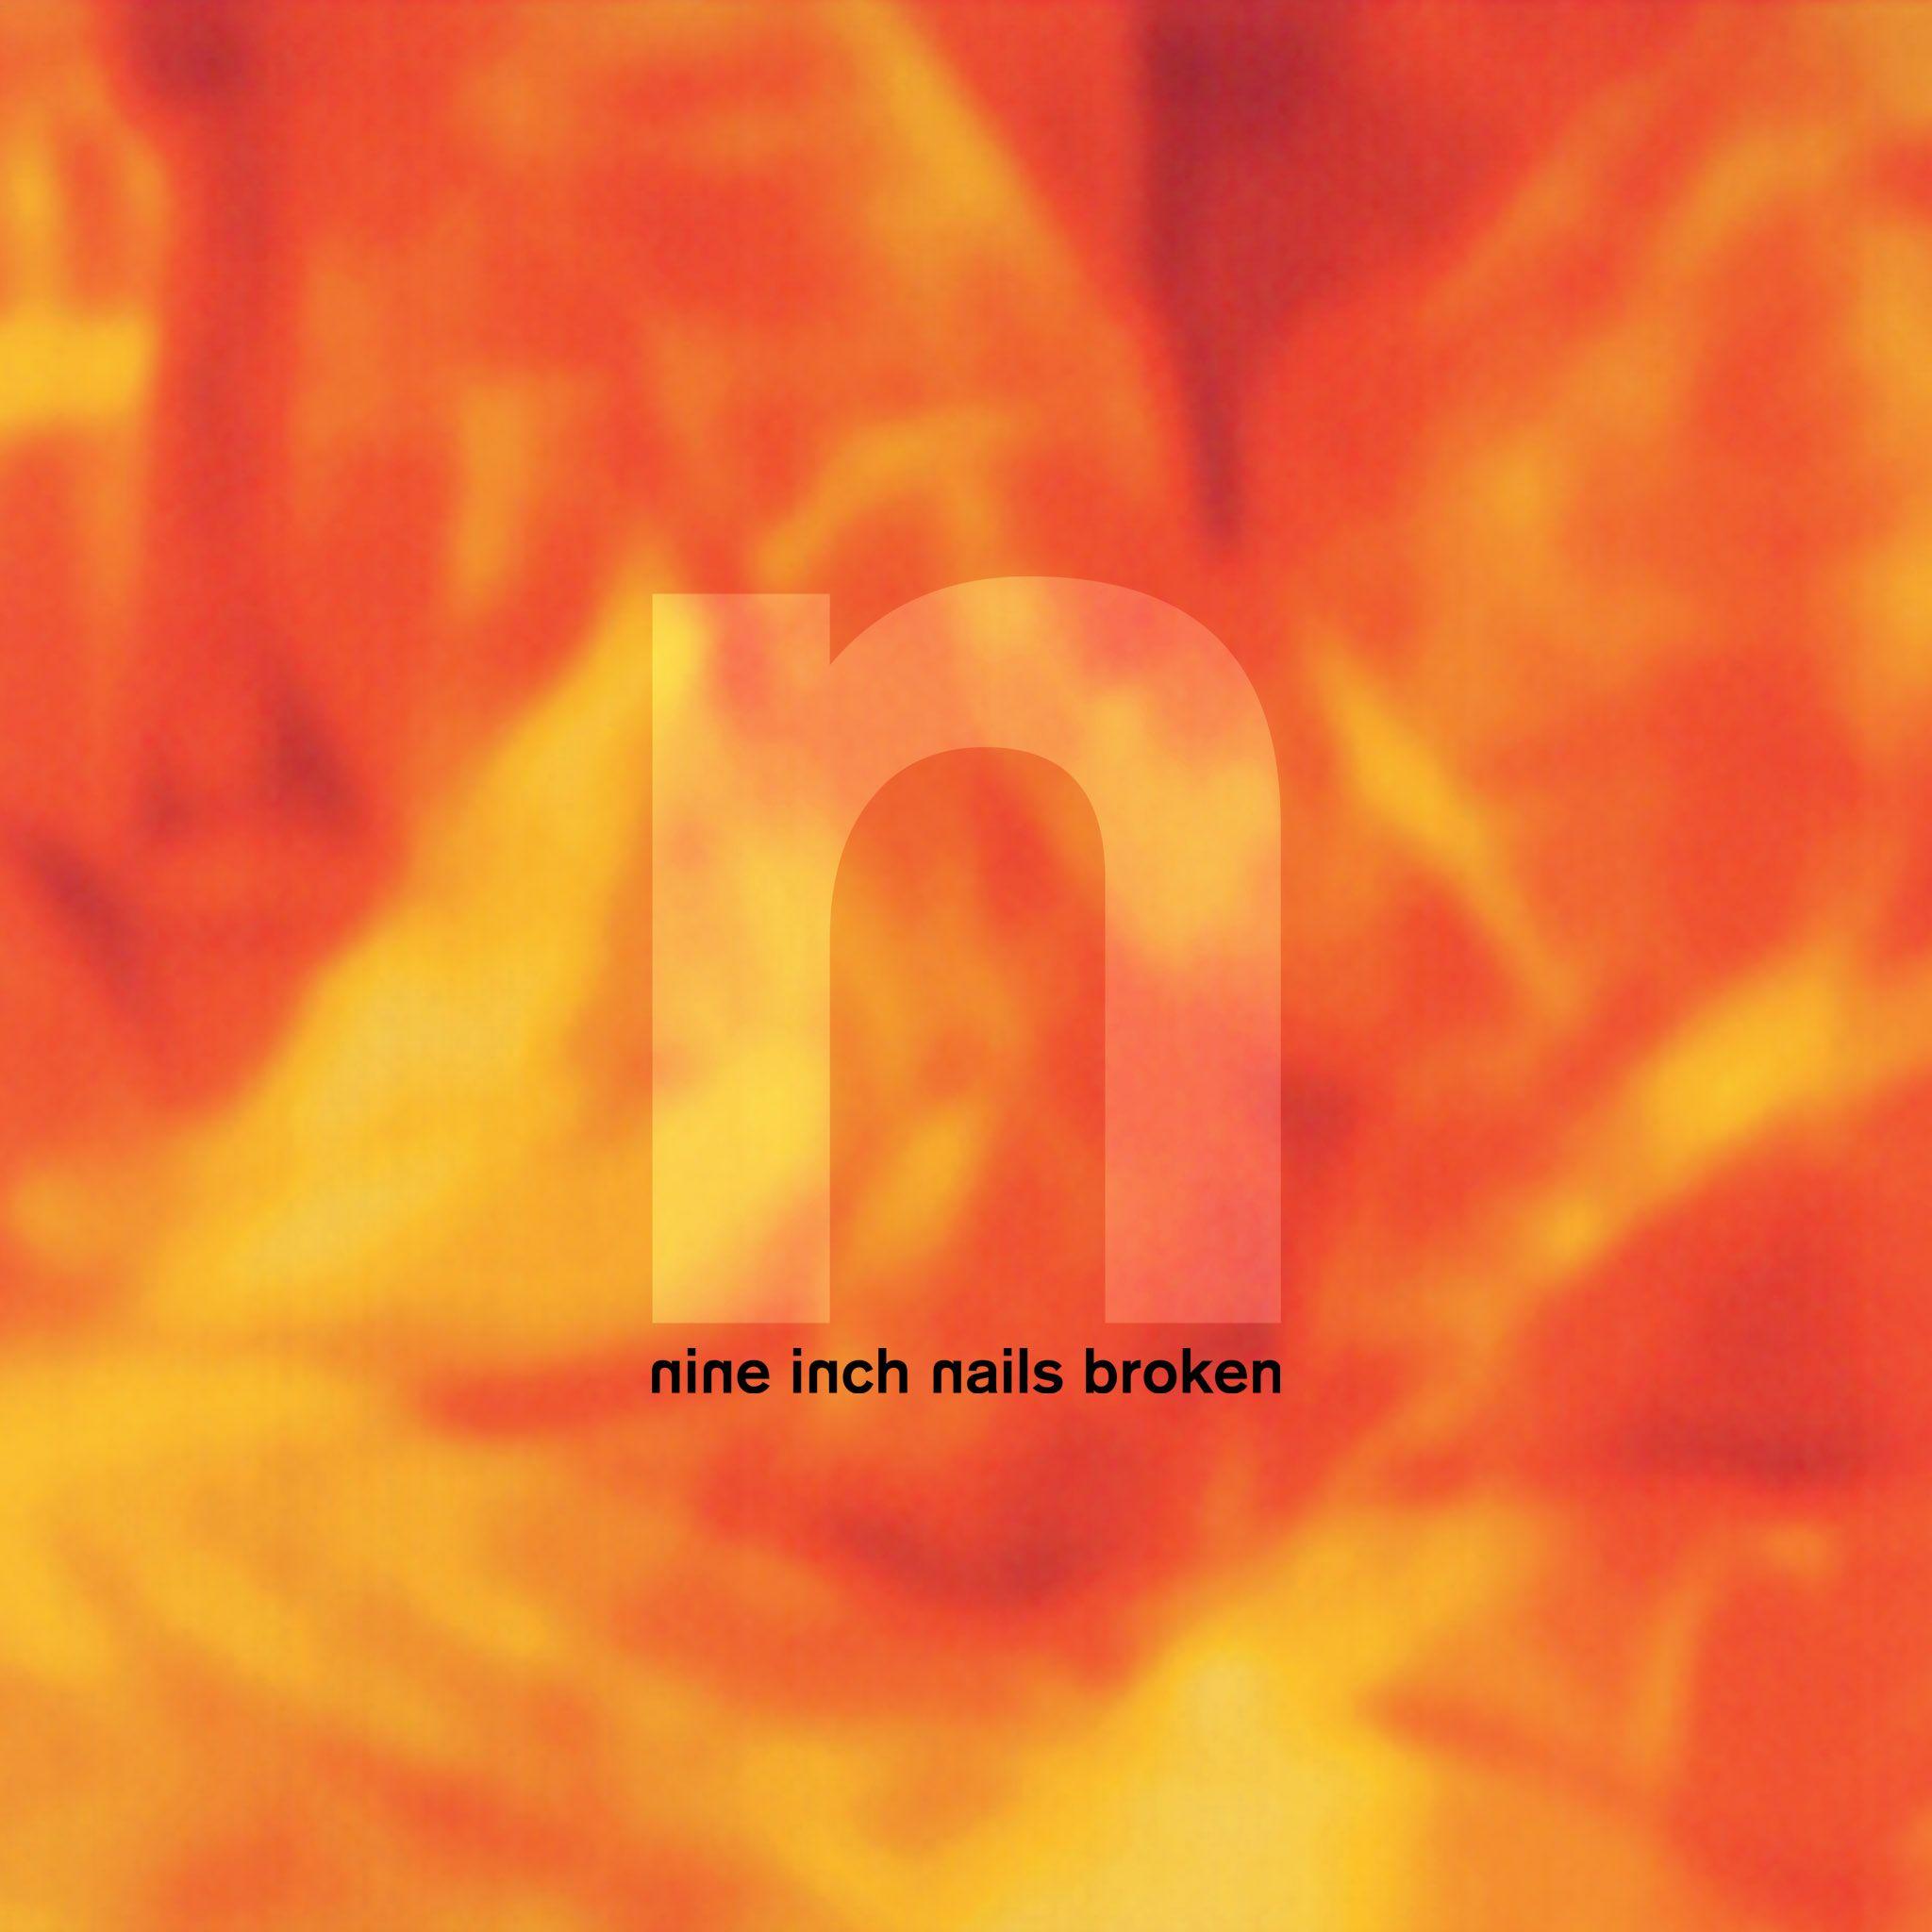 All Sizes Nine Inch Nails Broken Ipad Retina Wallpaper 2048 X